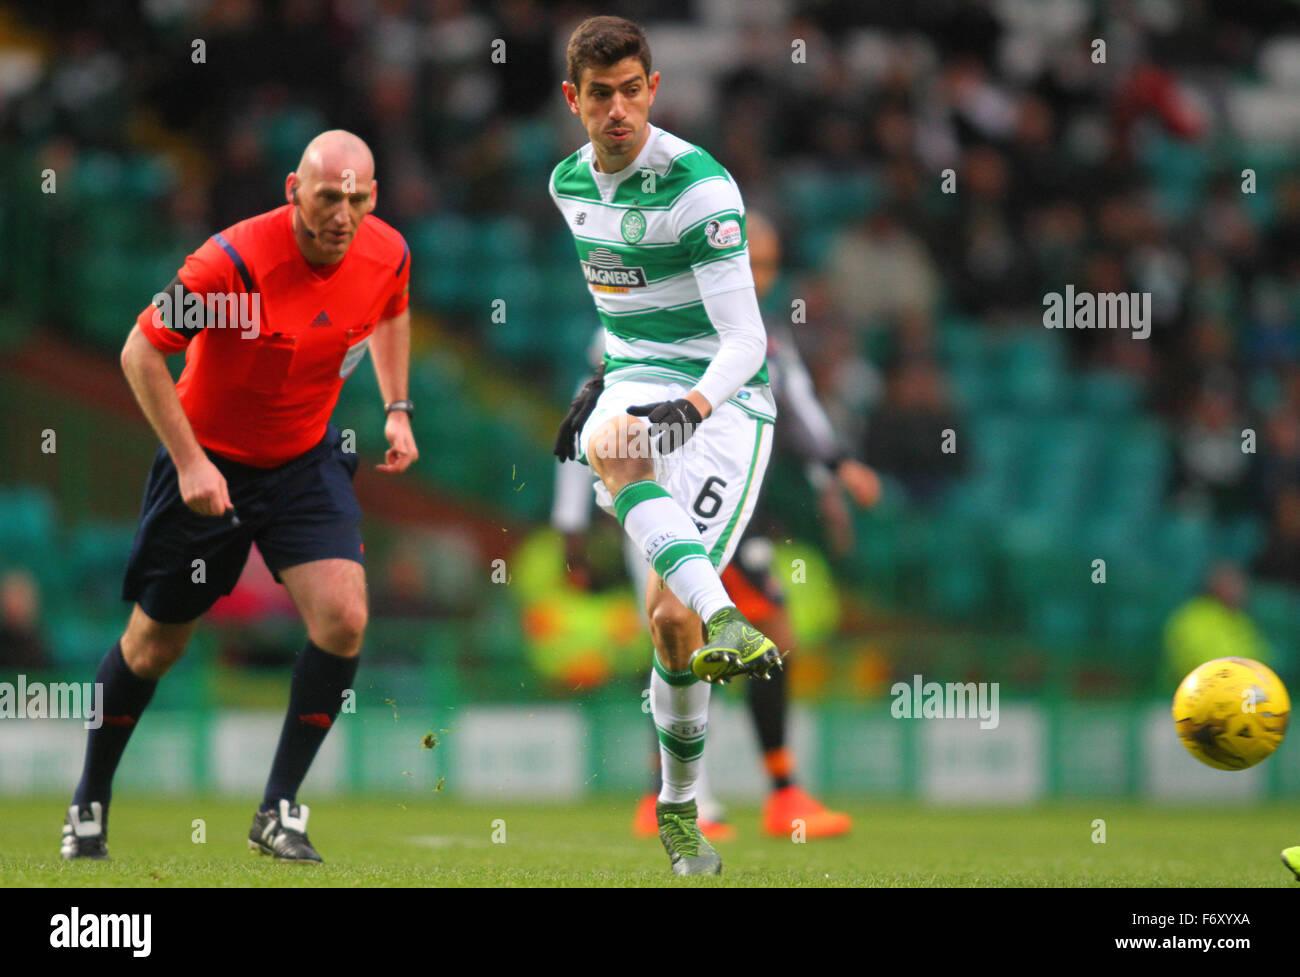 Glasgow, Scotland. 21st Nov, 2015. Scottish Premier League. Celtic versus Kilmarnock. Nir Bitton plays the ball - Stock Image